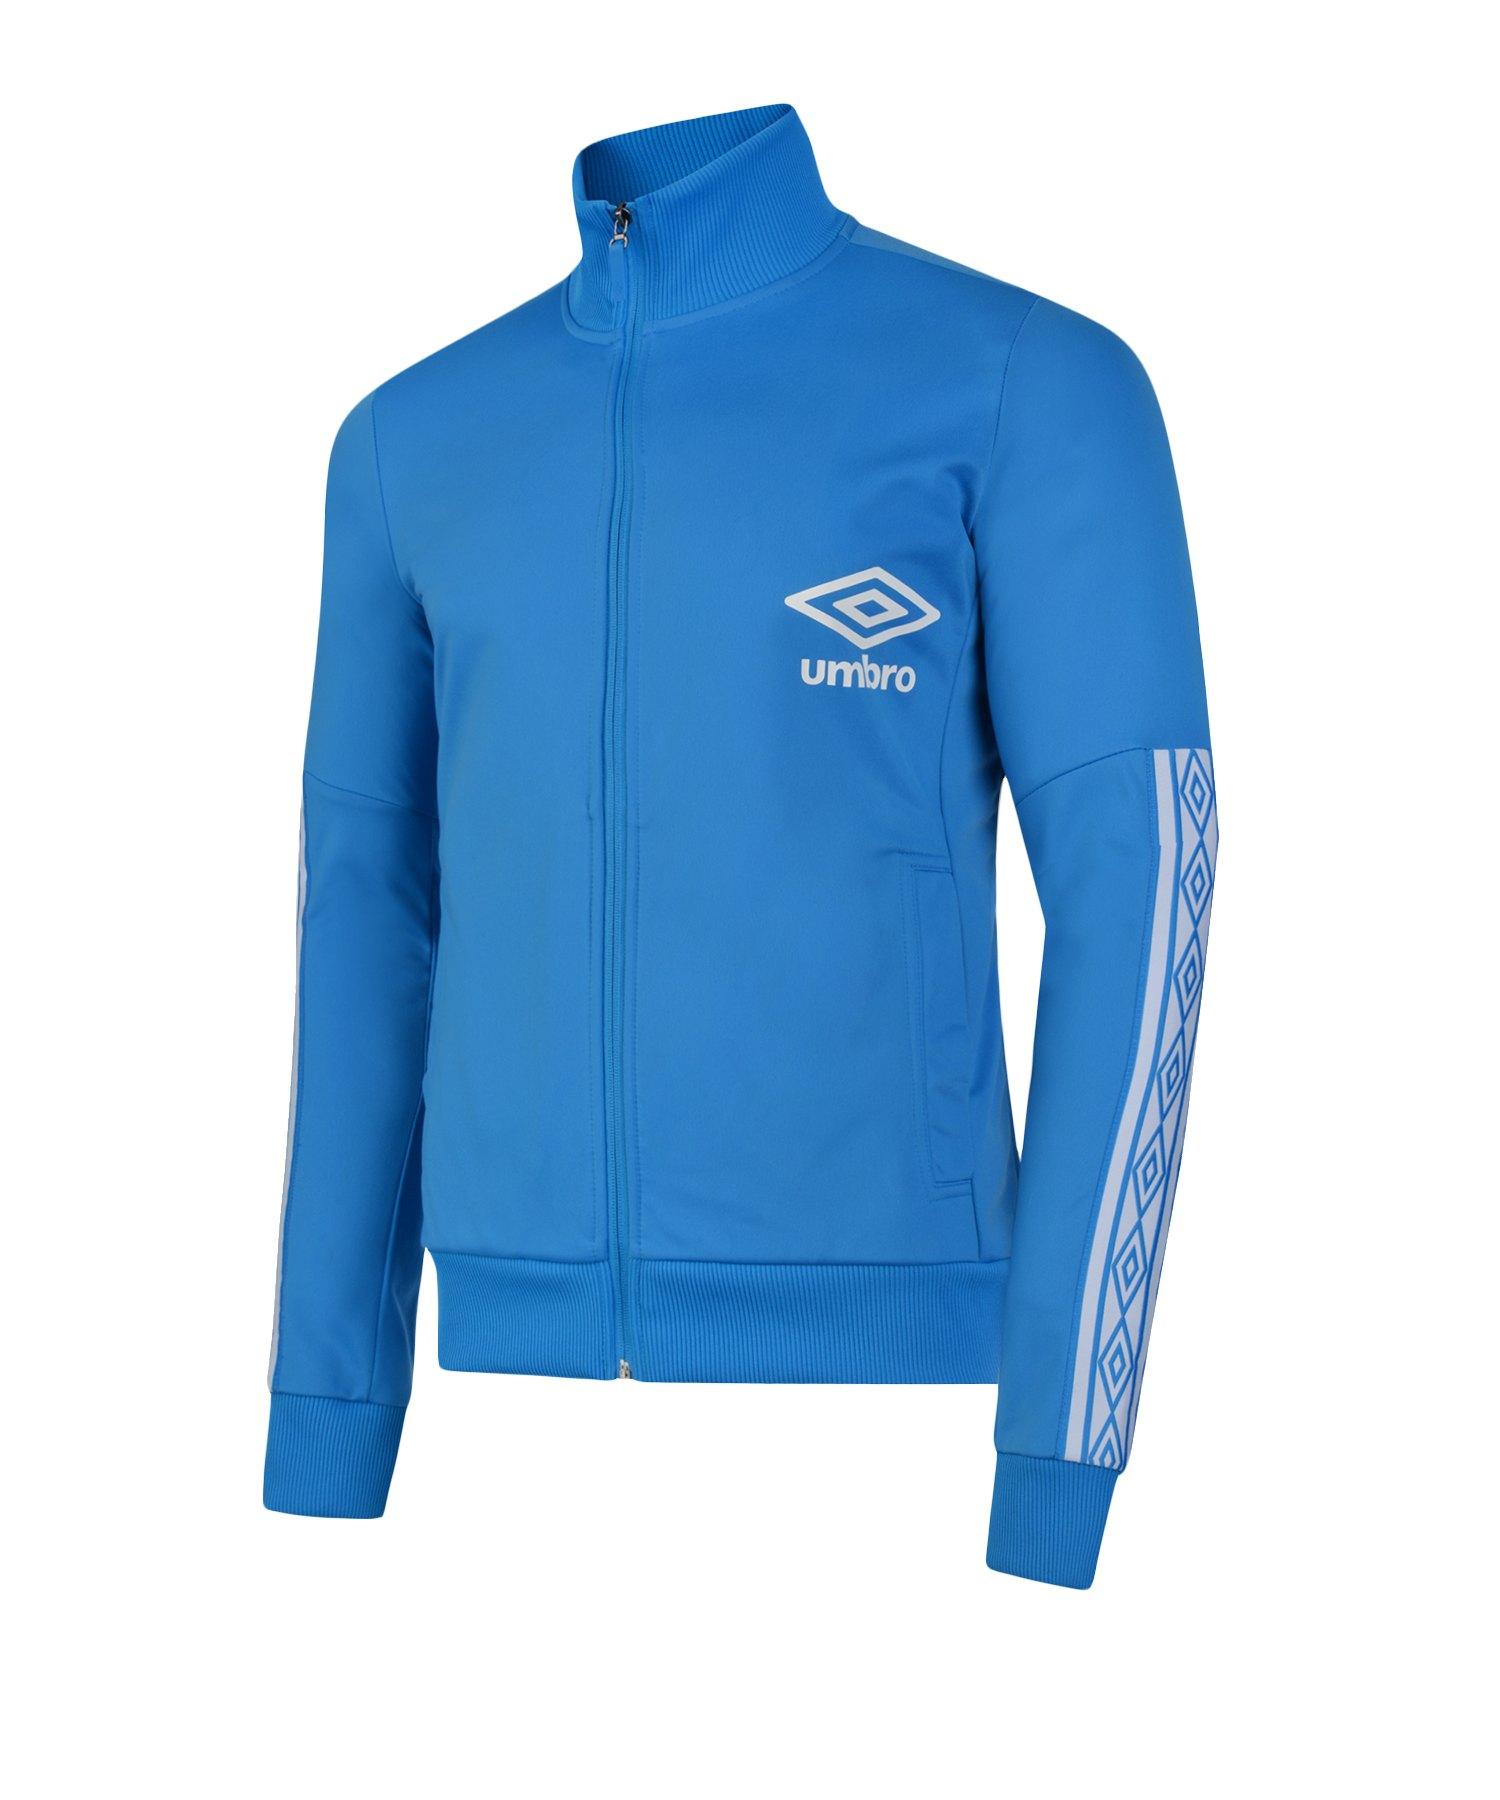 Umbro Track Jacket Jacke Blau FGPW - blau